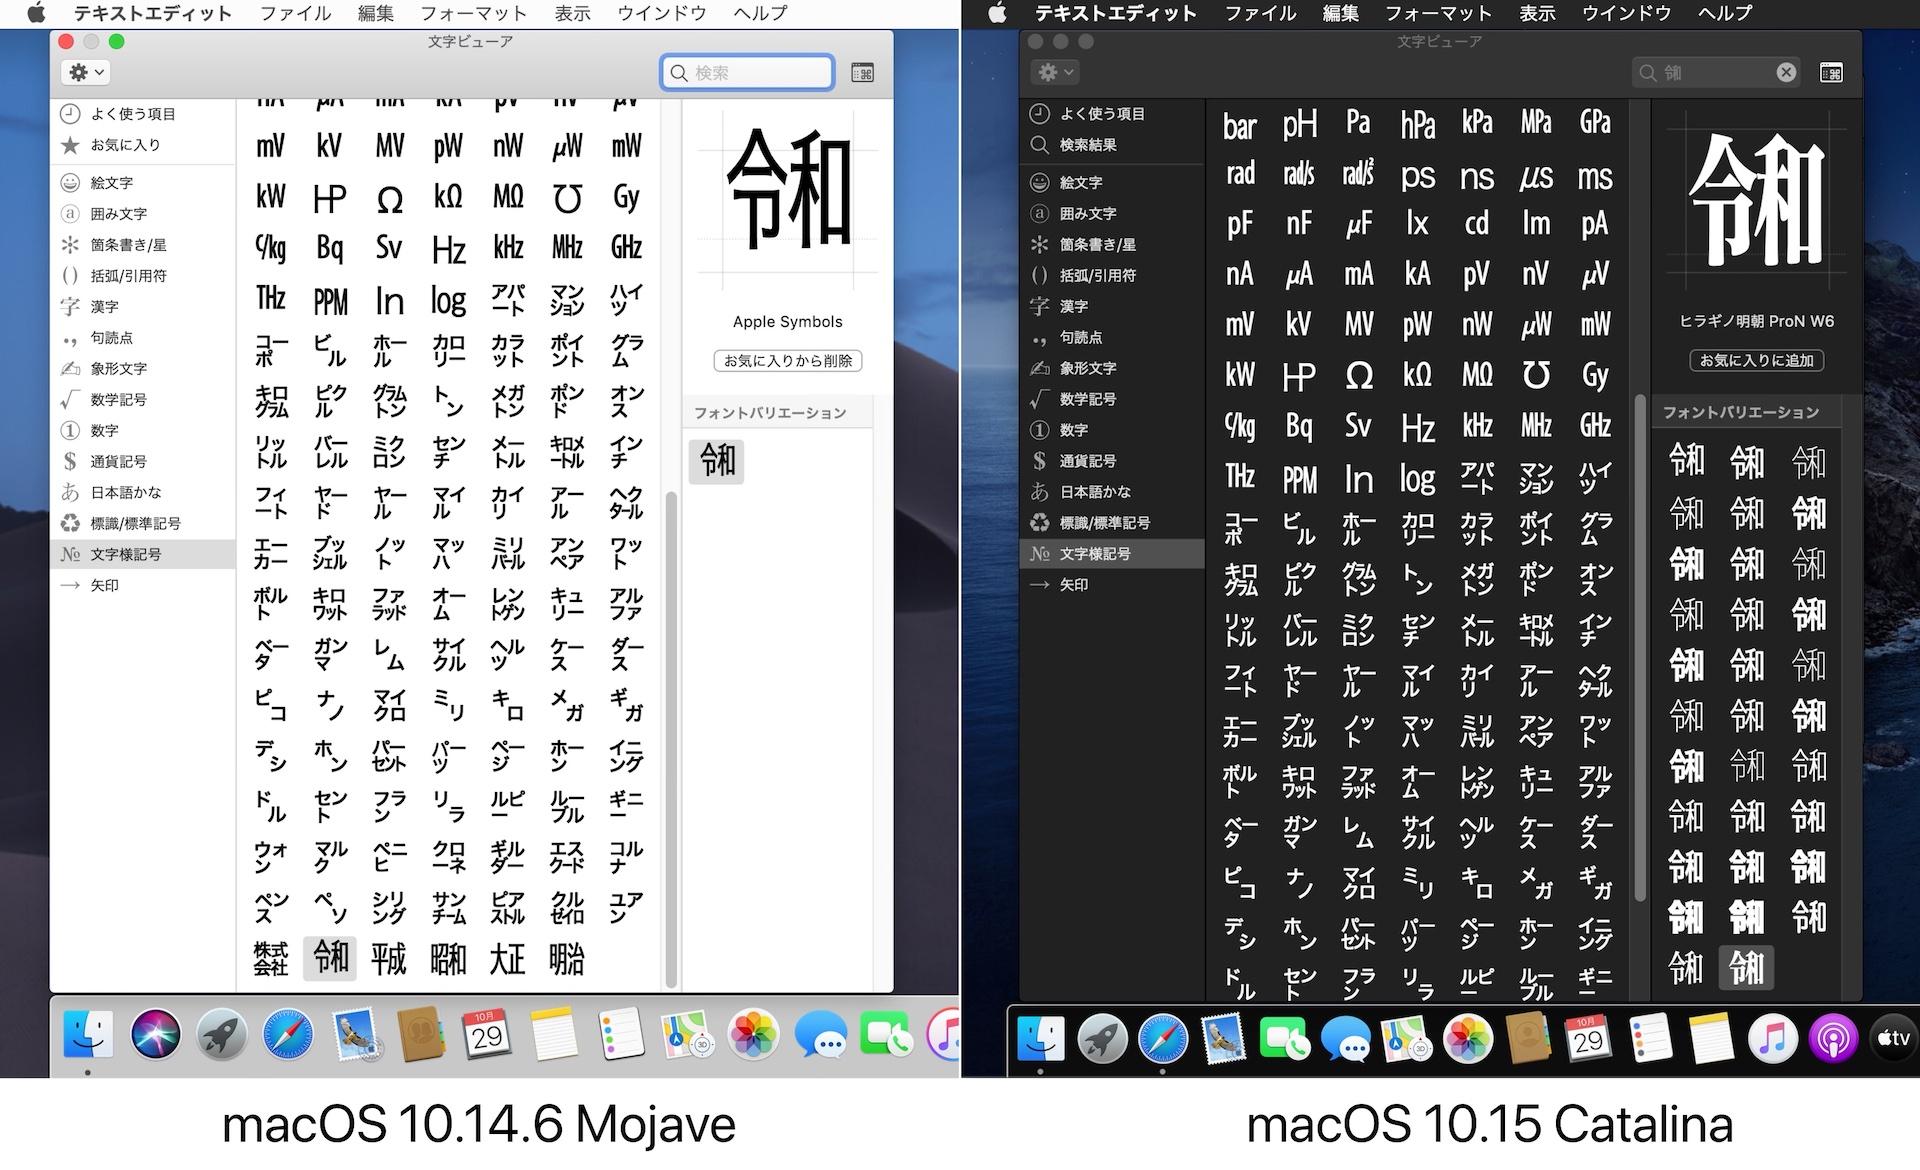 macOS 10.15 Catalinaの令和の合字